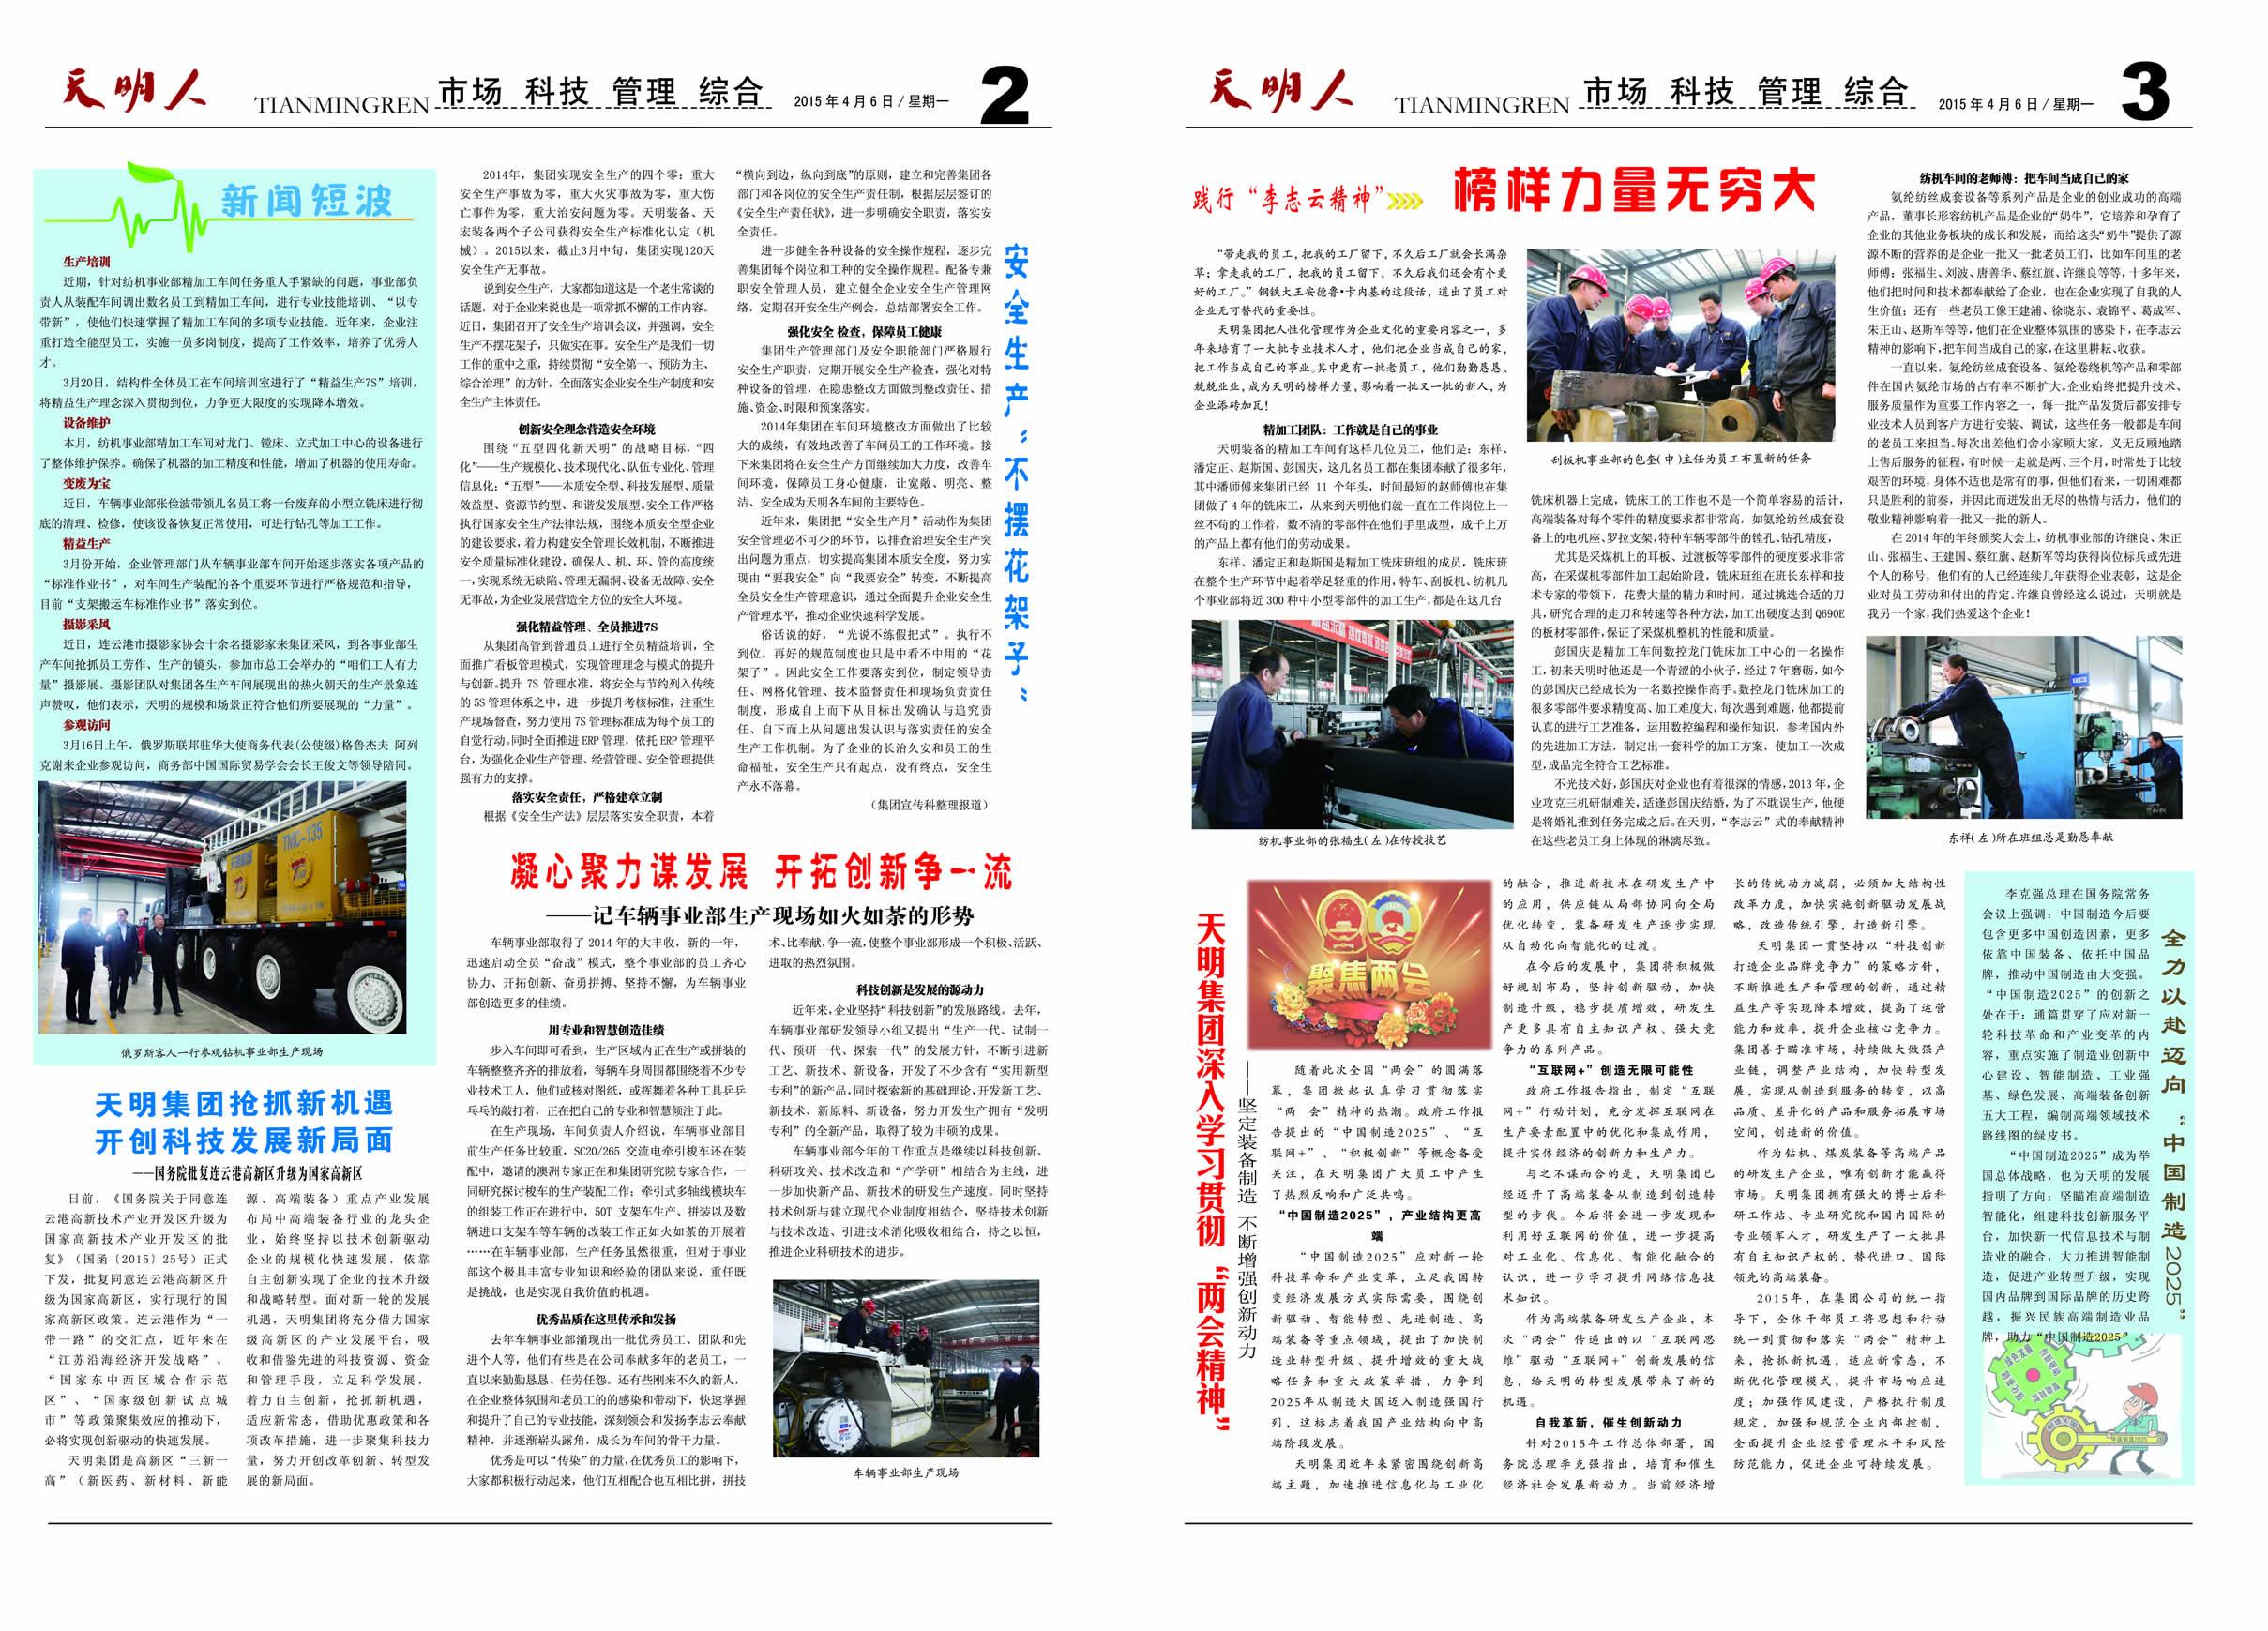 hg711皇冠国际_hg88皇冠国际平台_hg皇冠国际vip首页人2015第04期(总第90期)2、3版